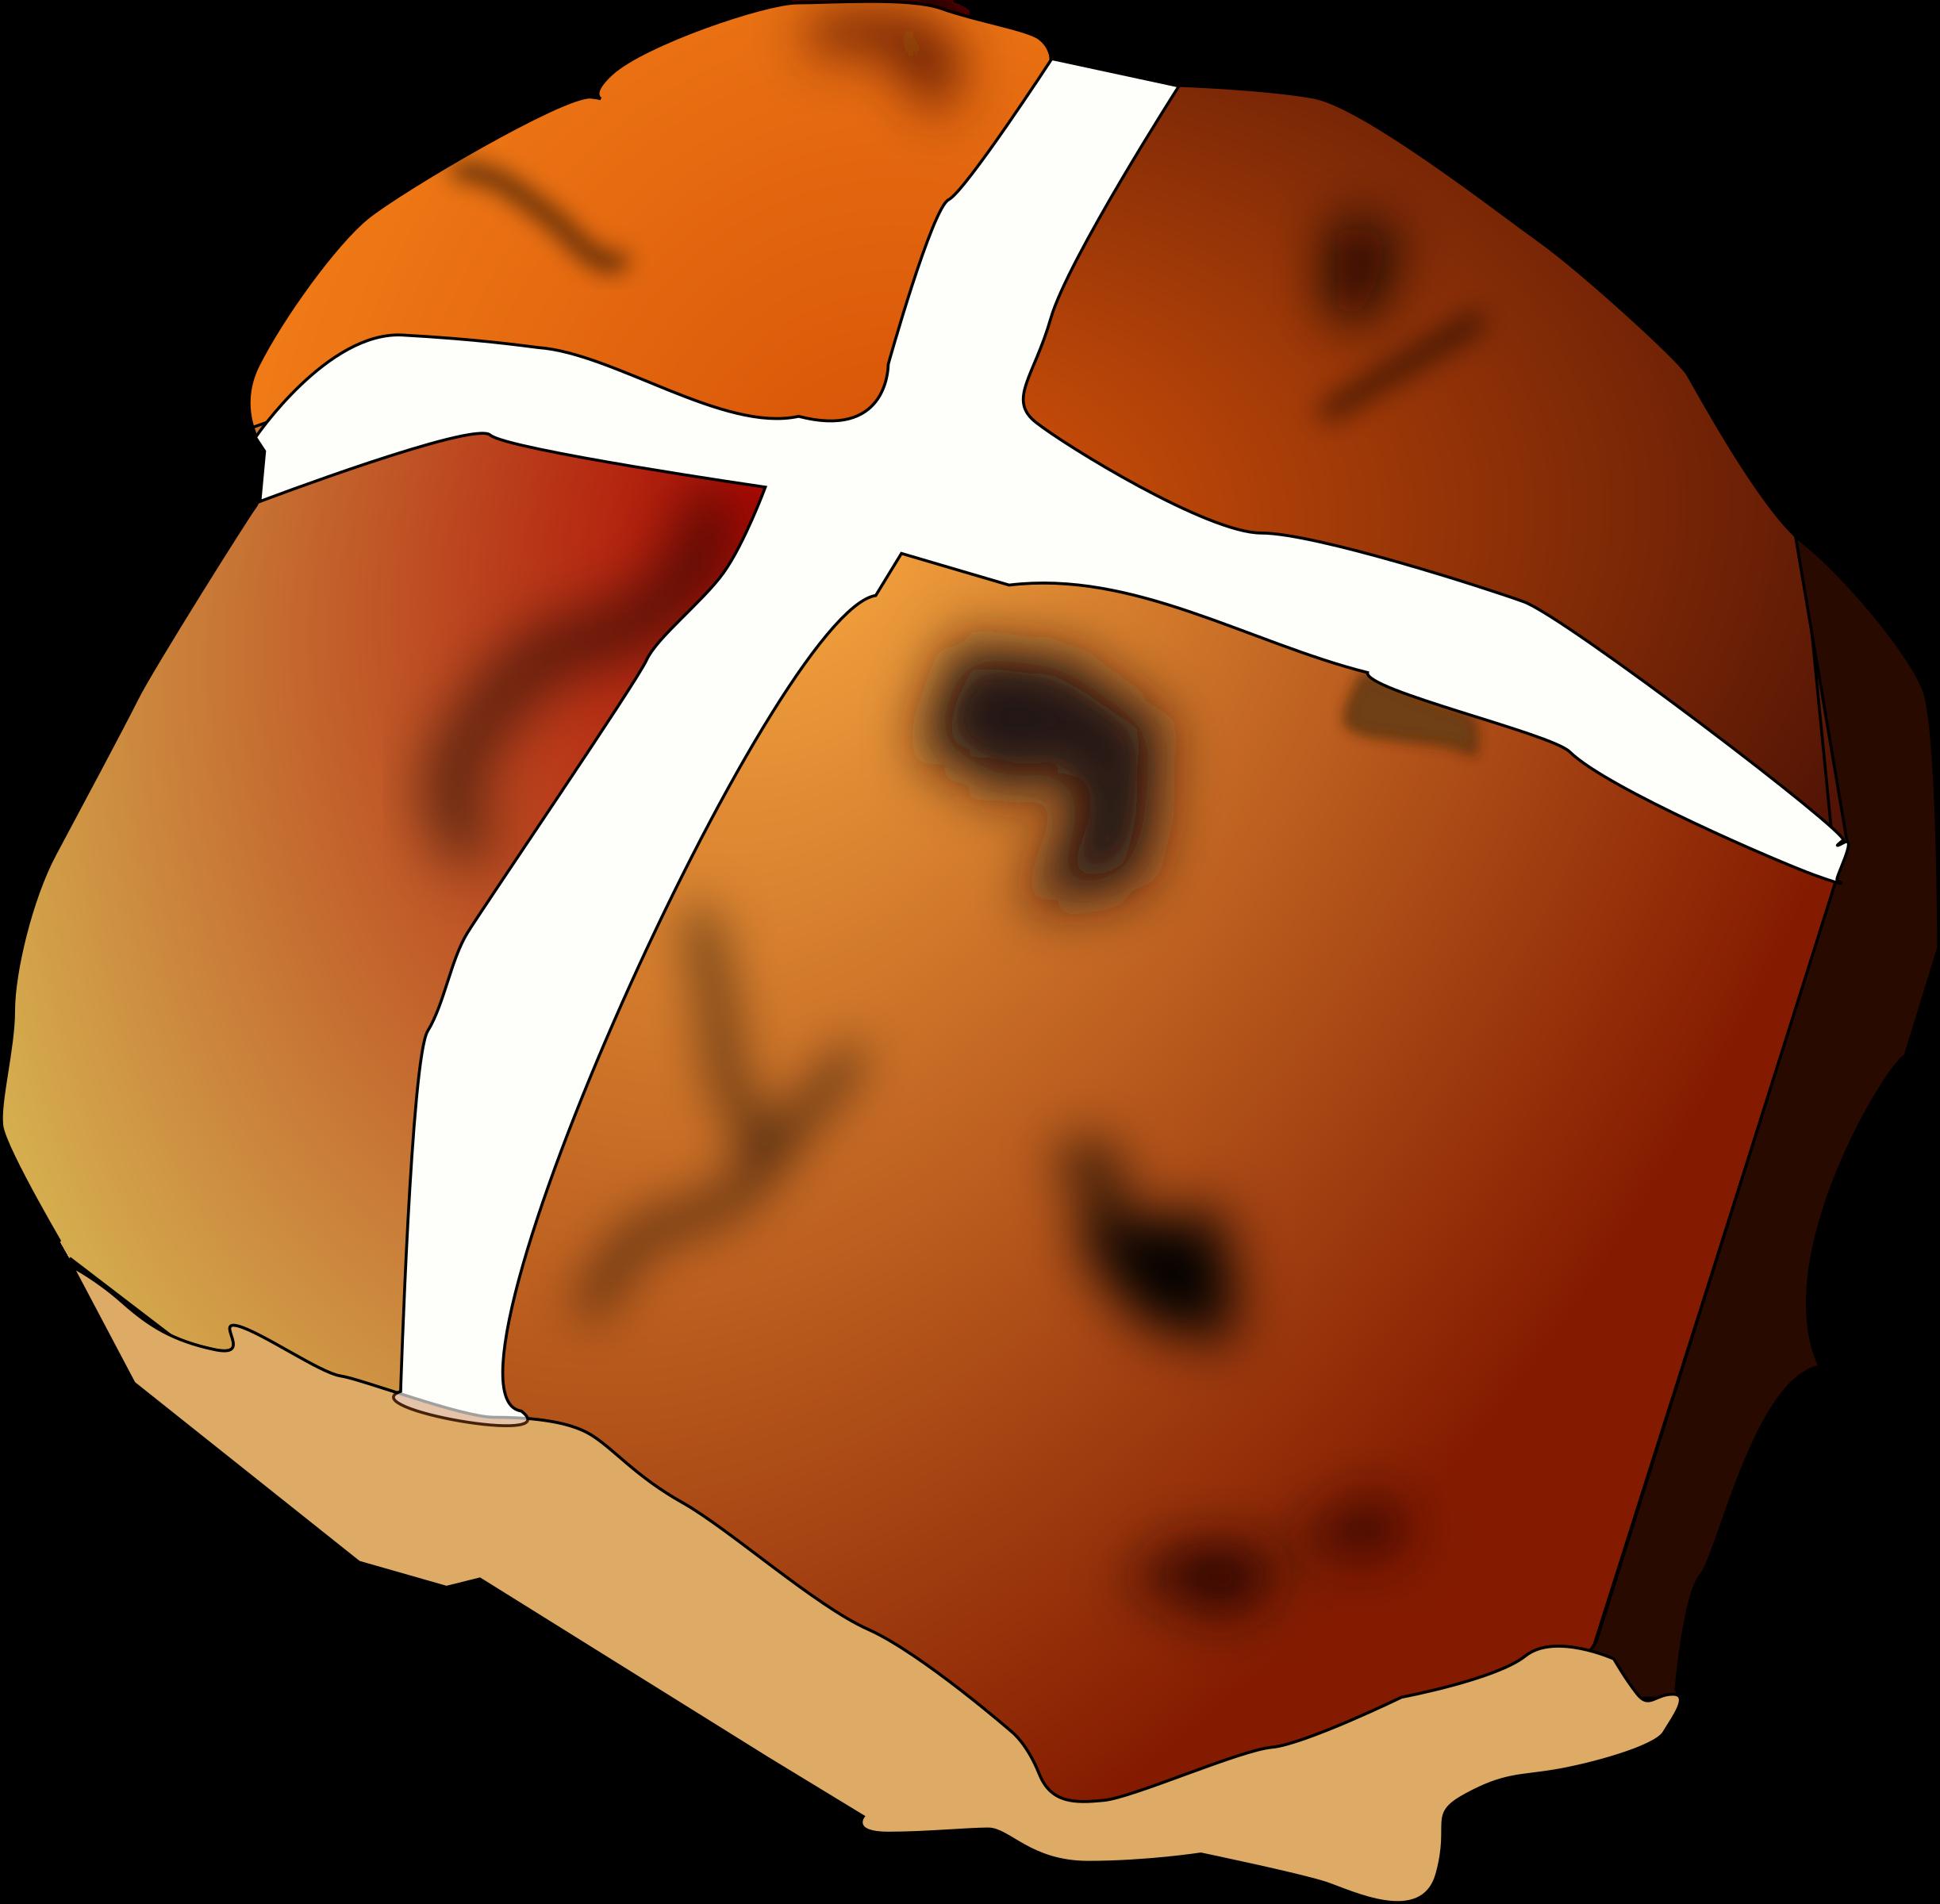 Bread Roll clipart hot cross buns Bun by tom Clipart cross